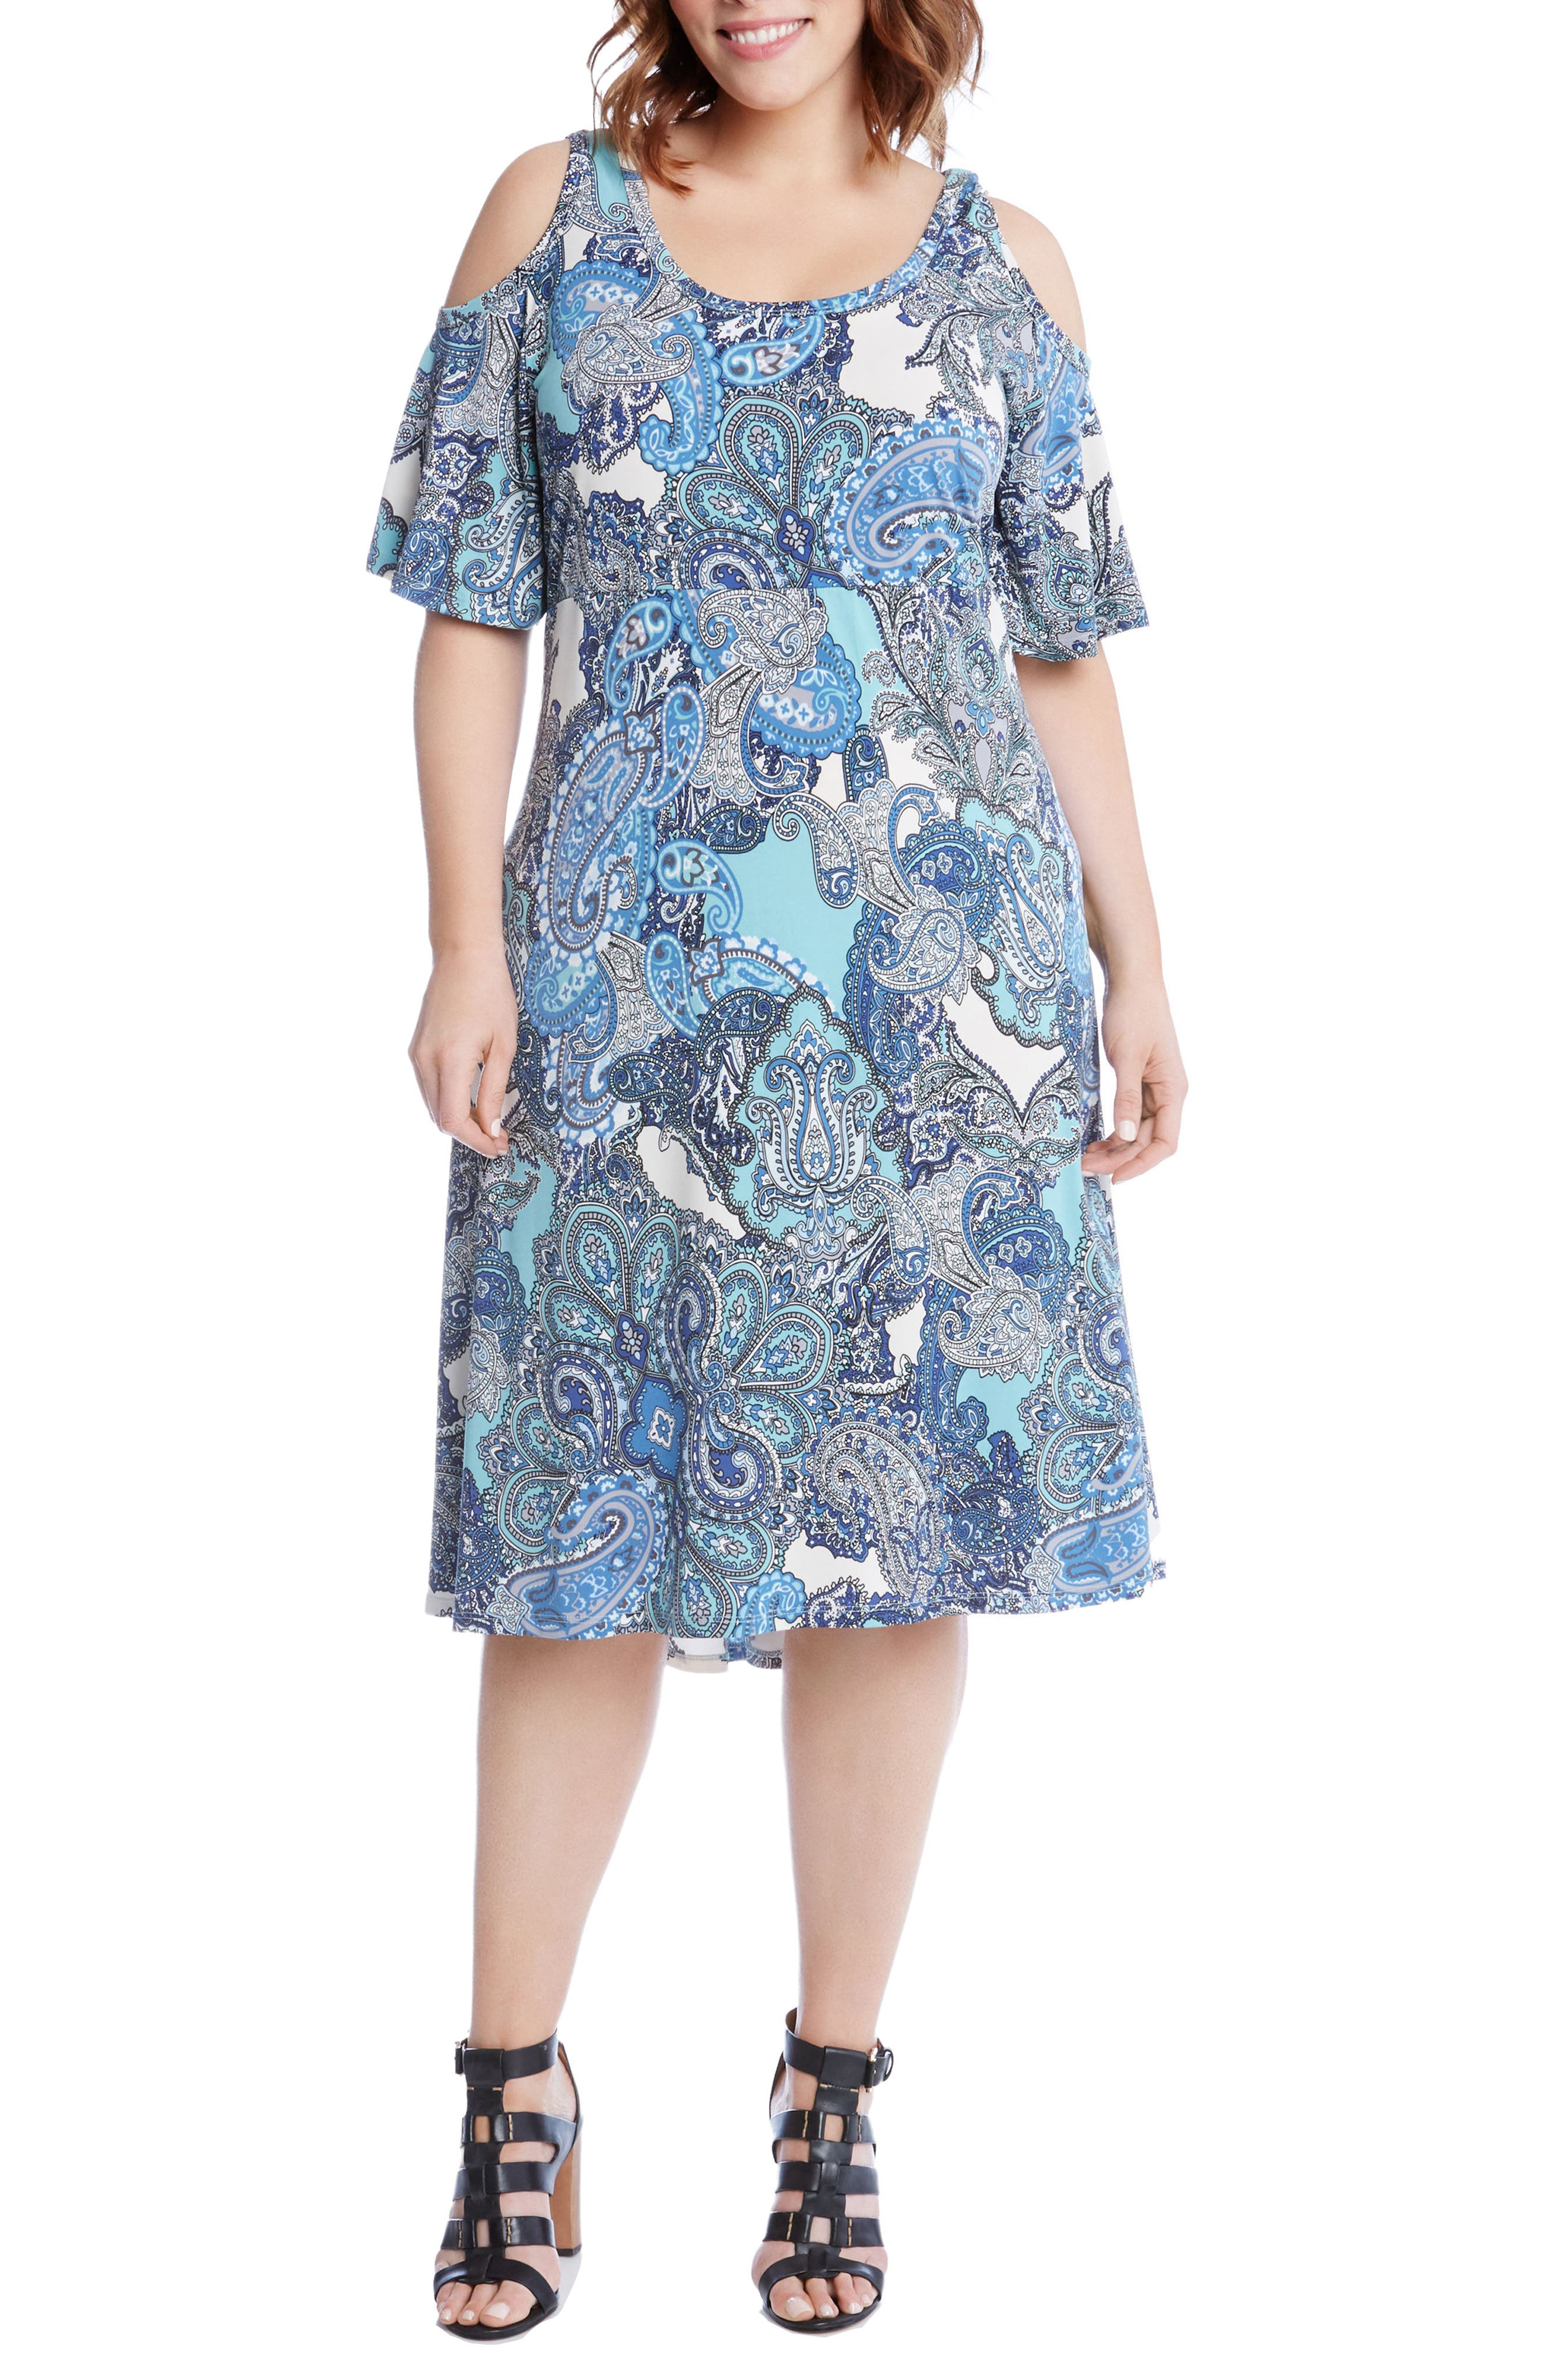 Alternate Image 1 Selected - Karen Kane Cold Shoulder Paisley Midi Dress (Plus Size)